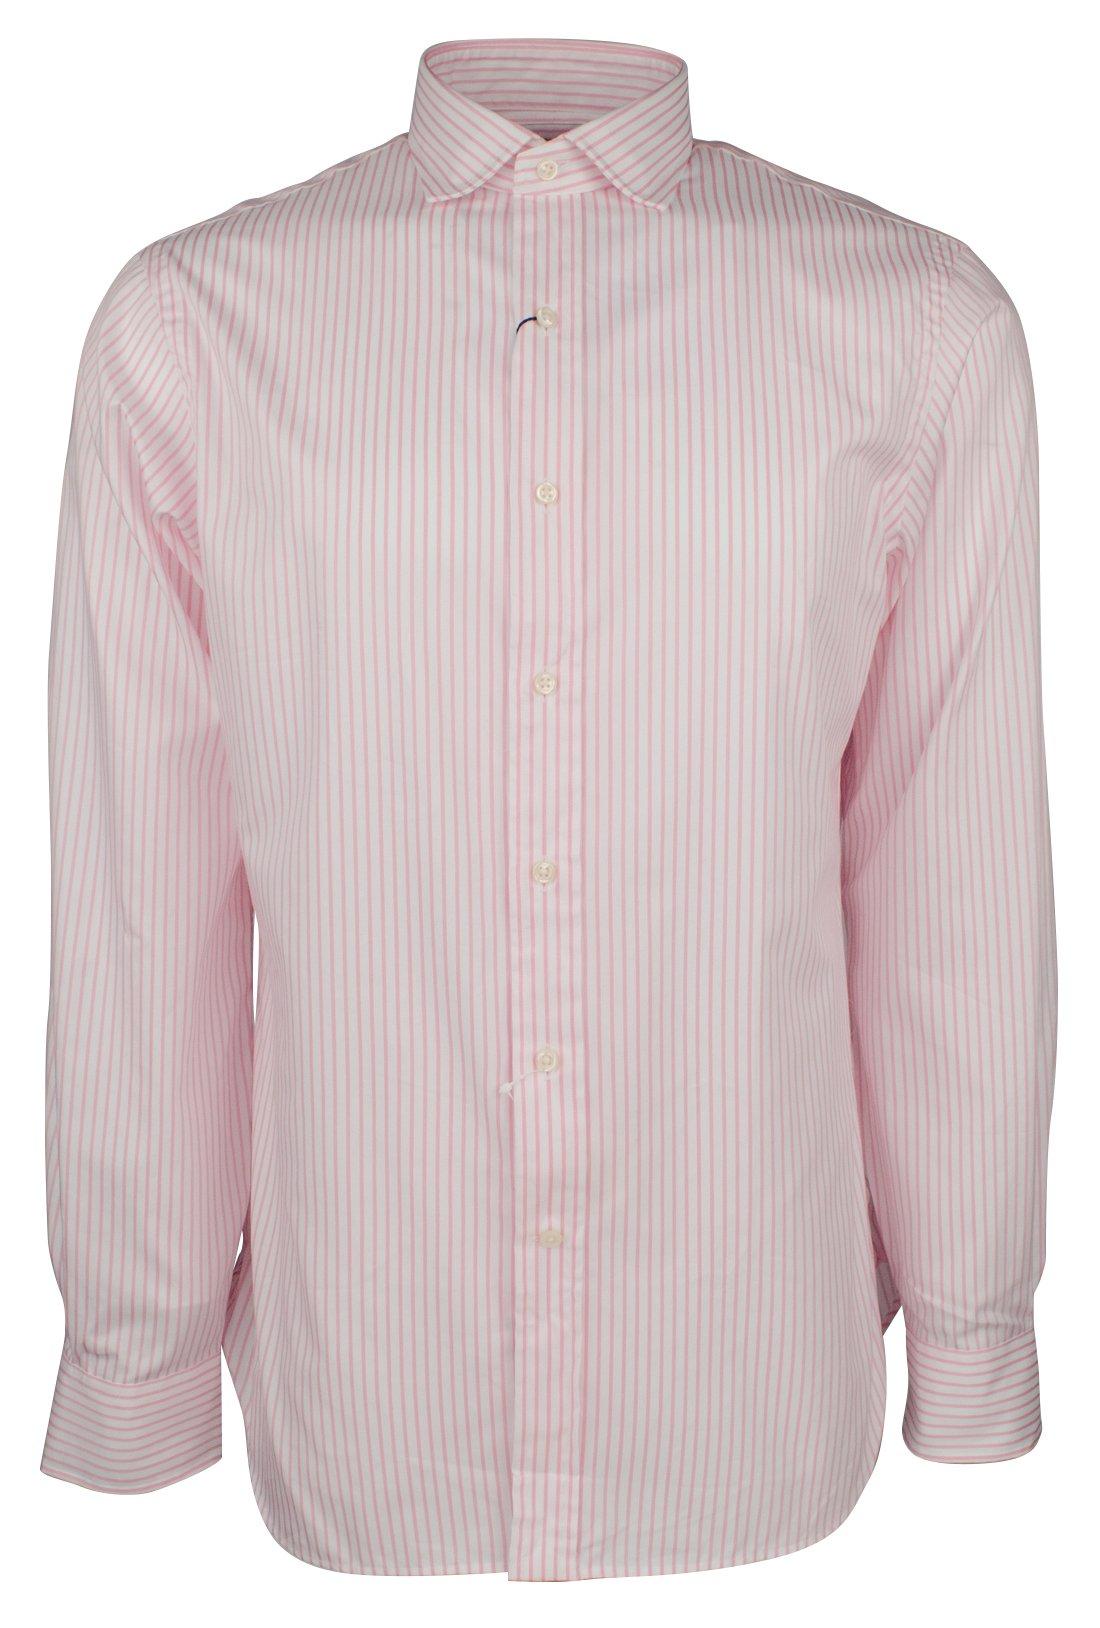 Polo Ralph Lauren Men's Slim Fit Striped Cotton Shirt-PW-17-43